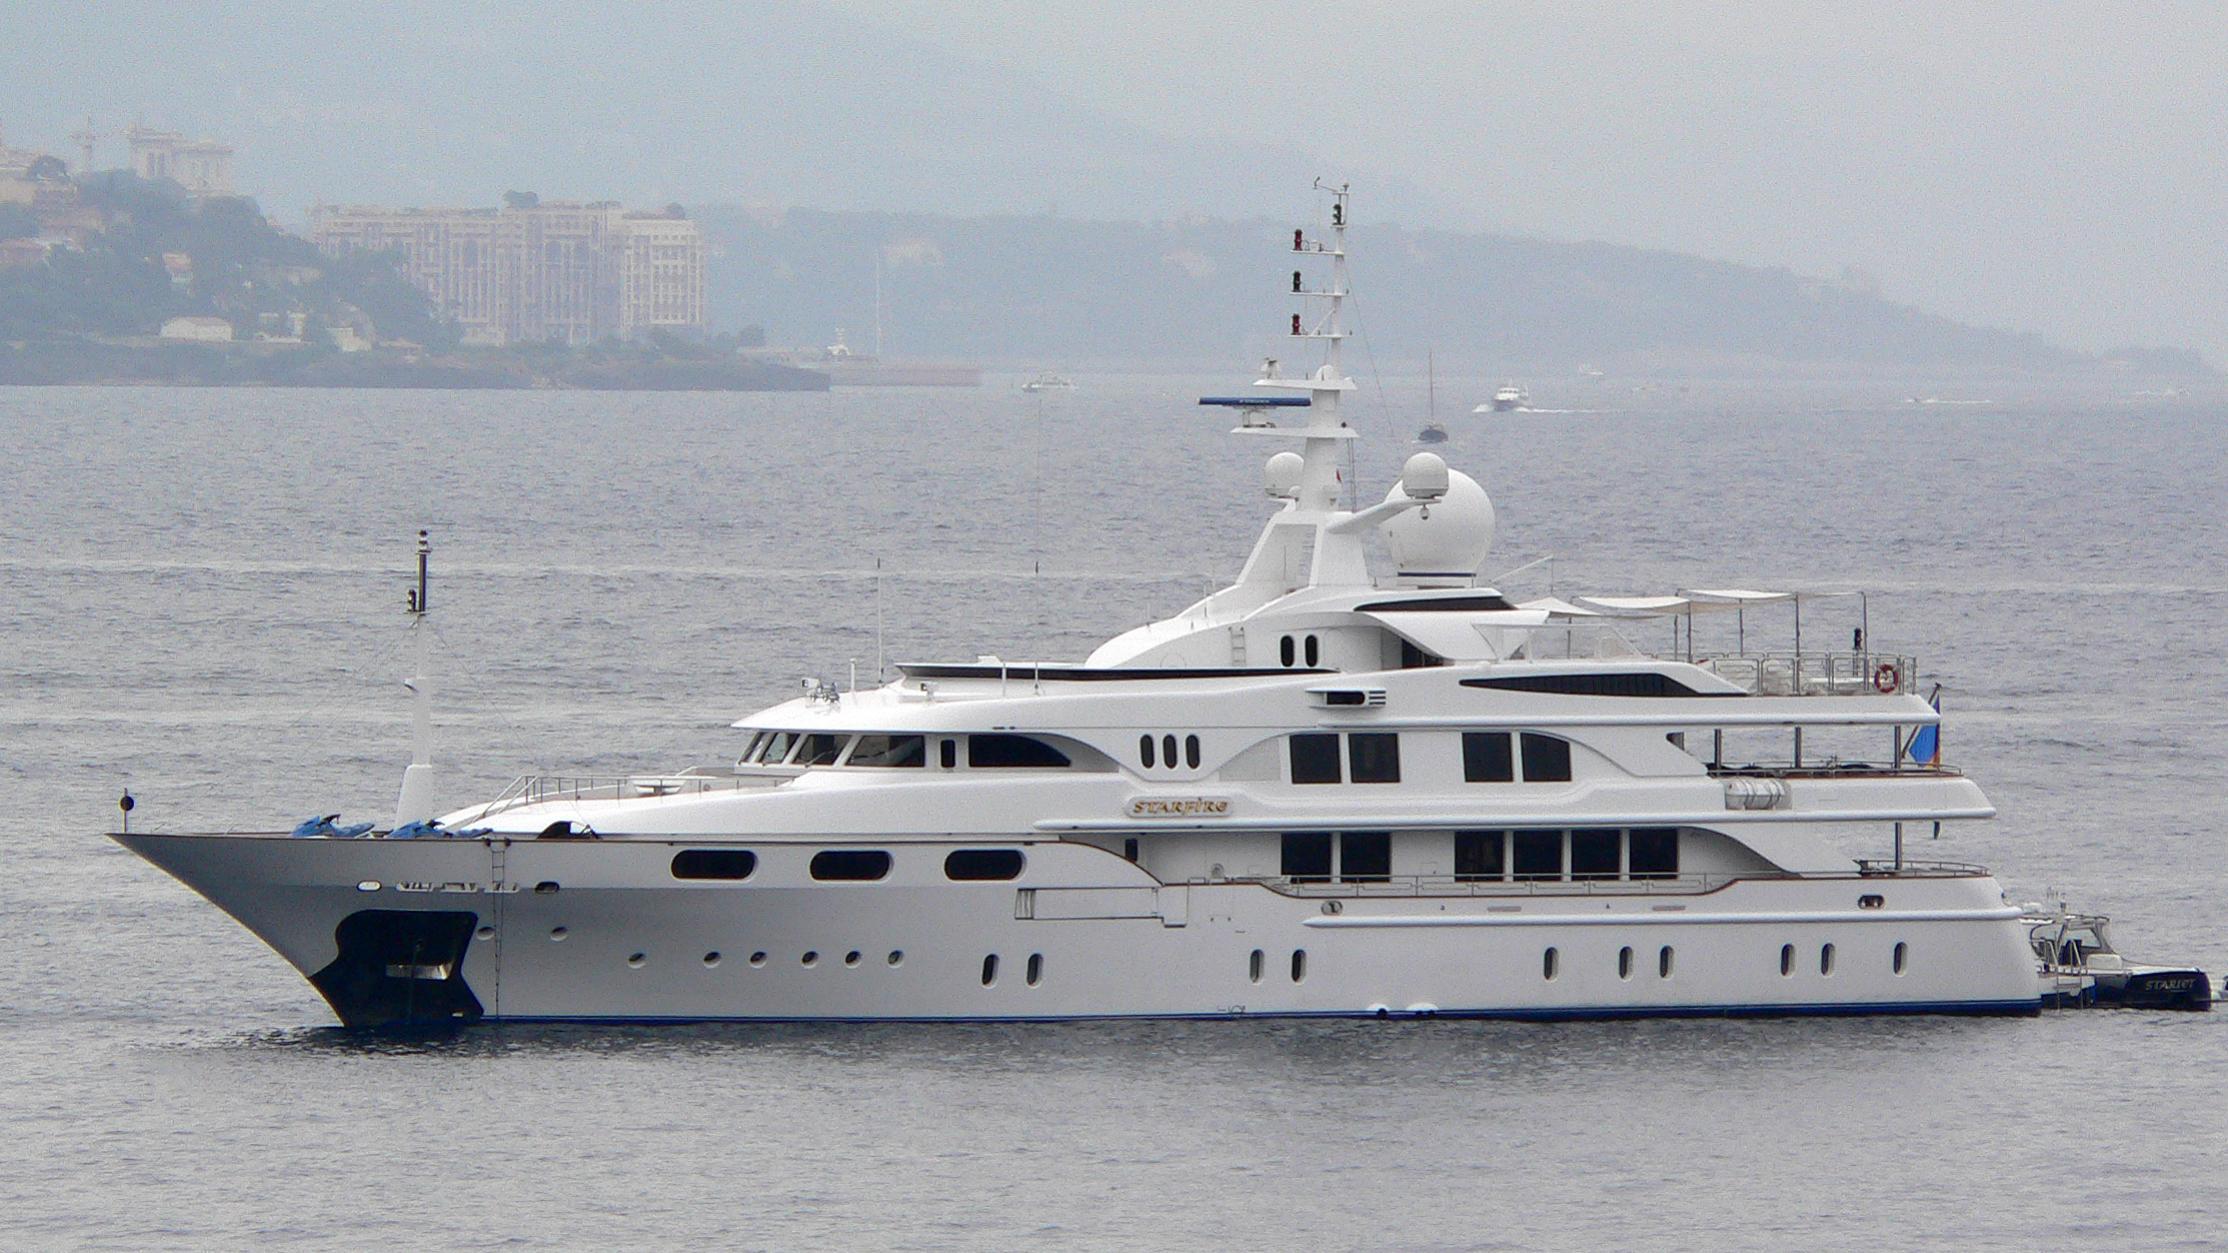 starfire-motor-yacht-benetti-1998-54m-profile